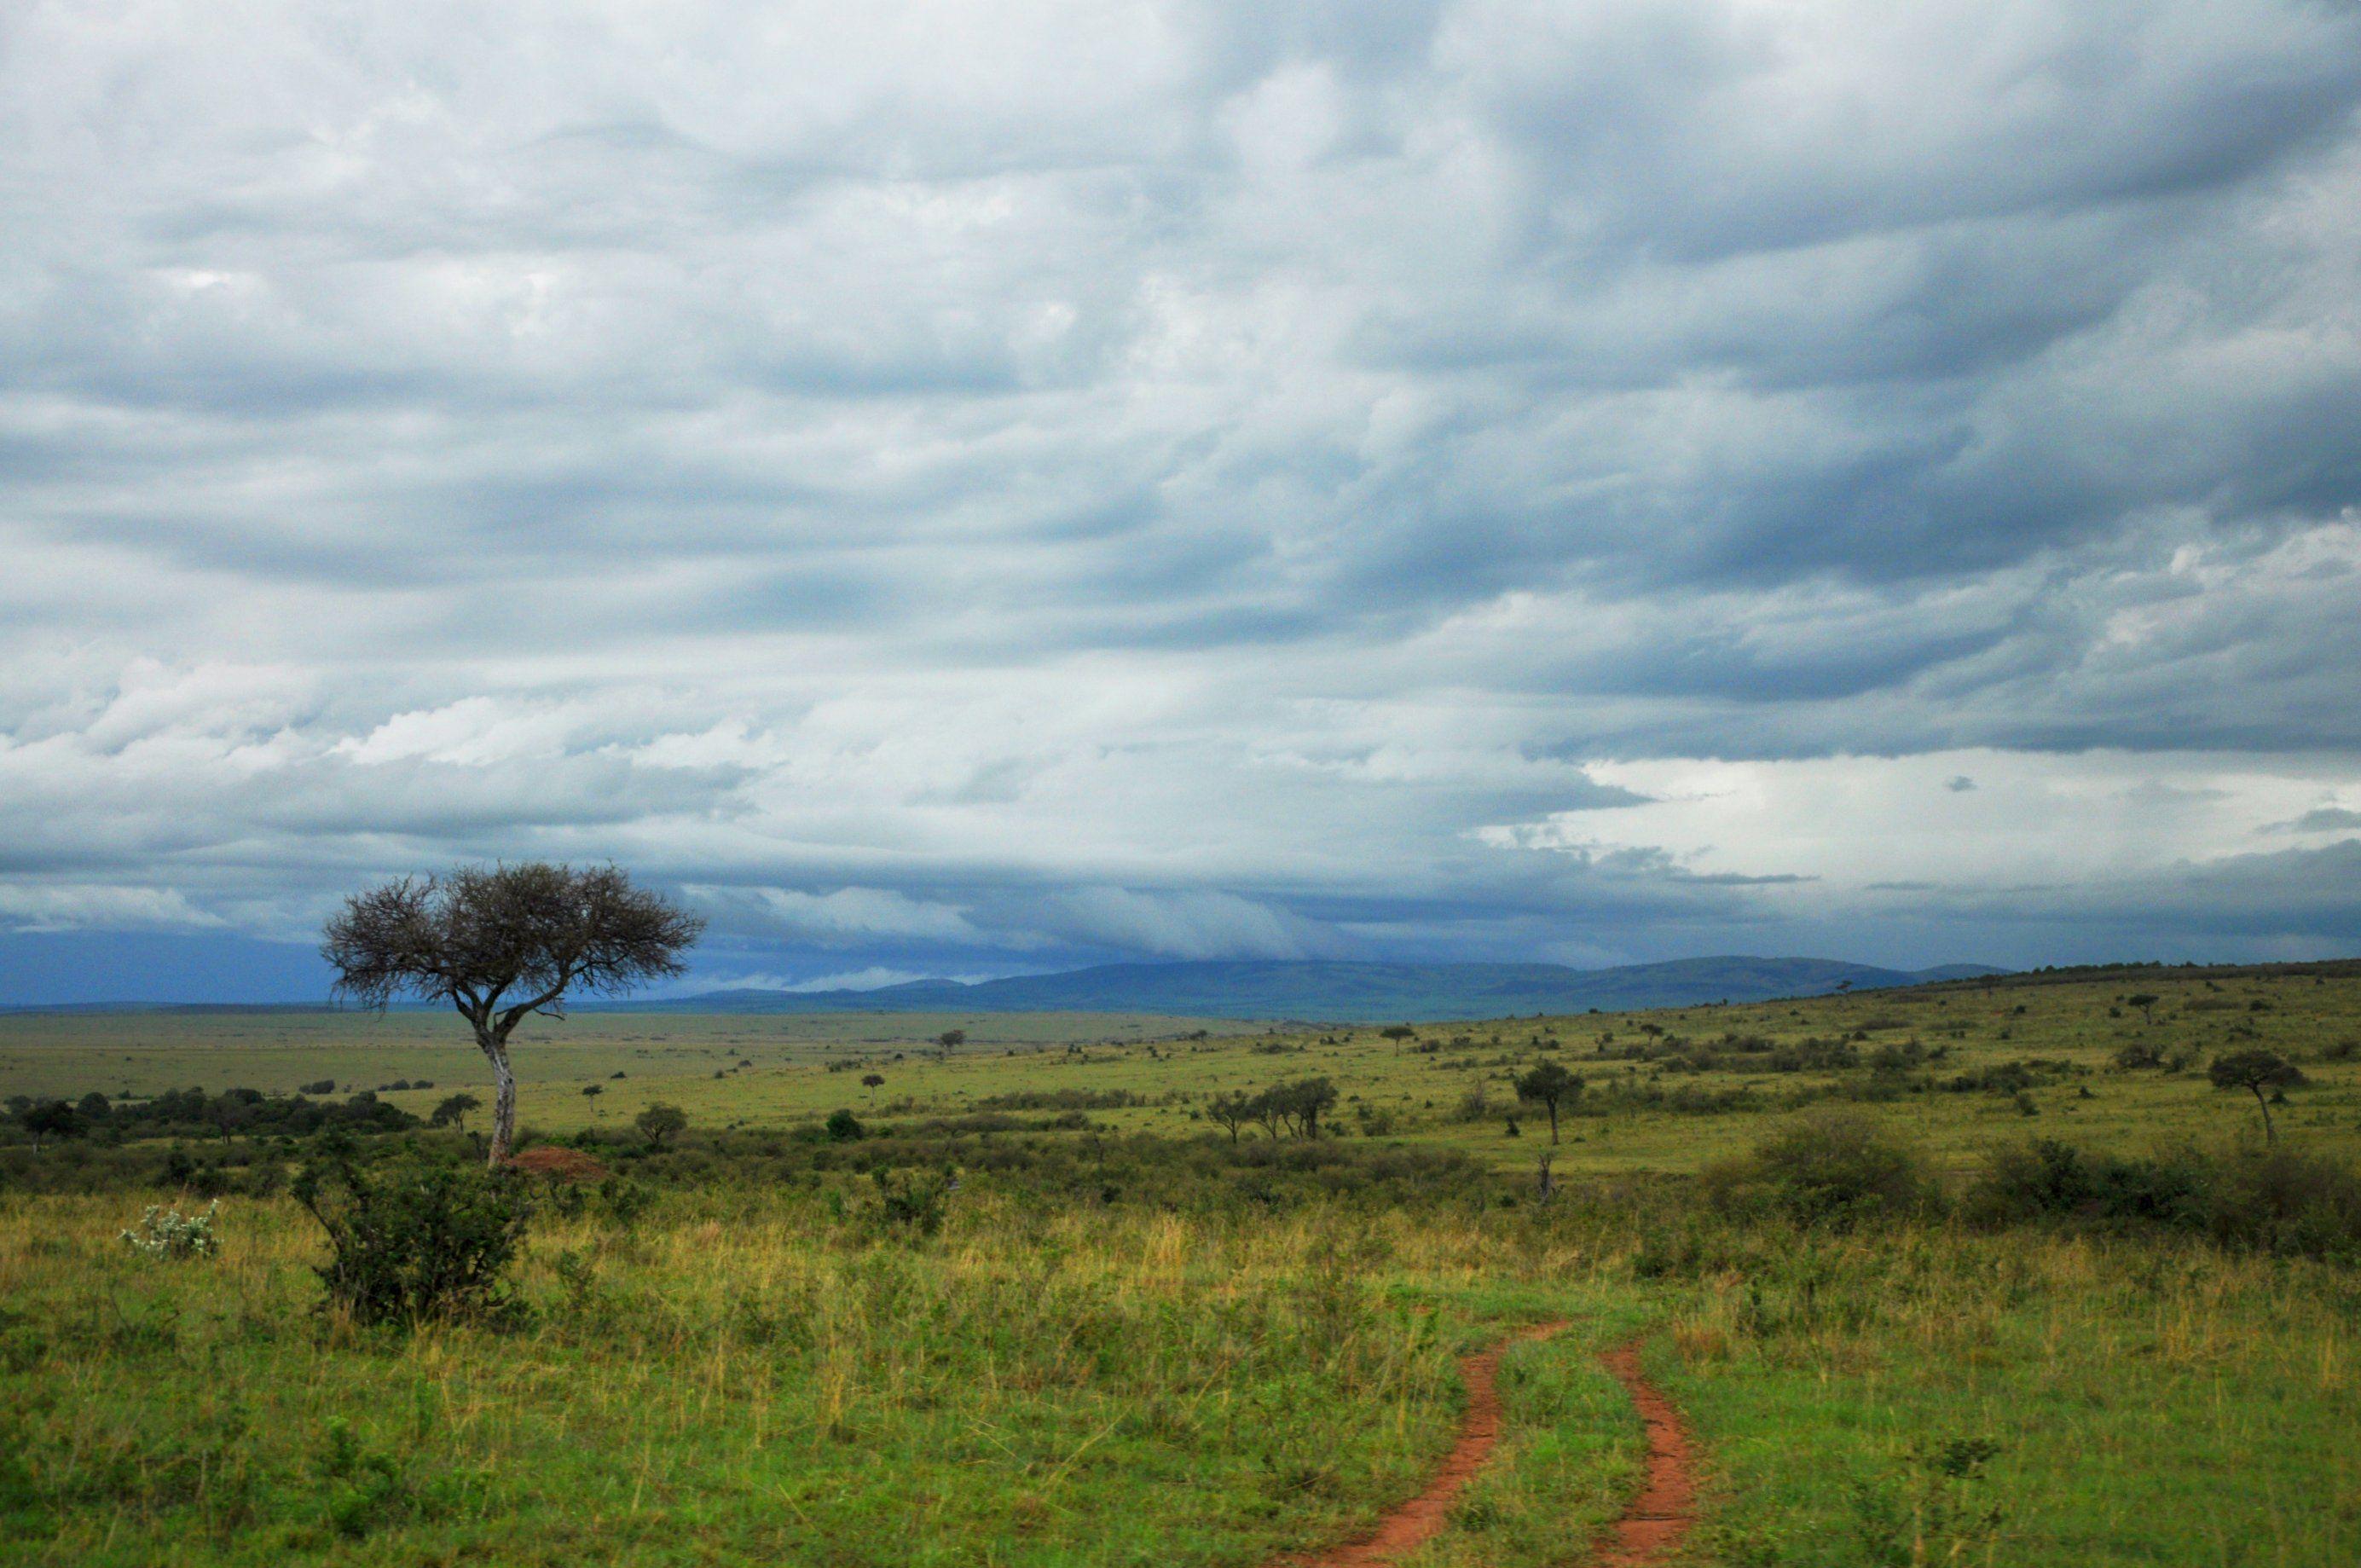 Becca in Kenya: The Saikeri Series - Becca describes her first day back!